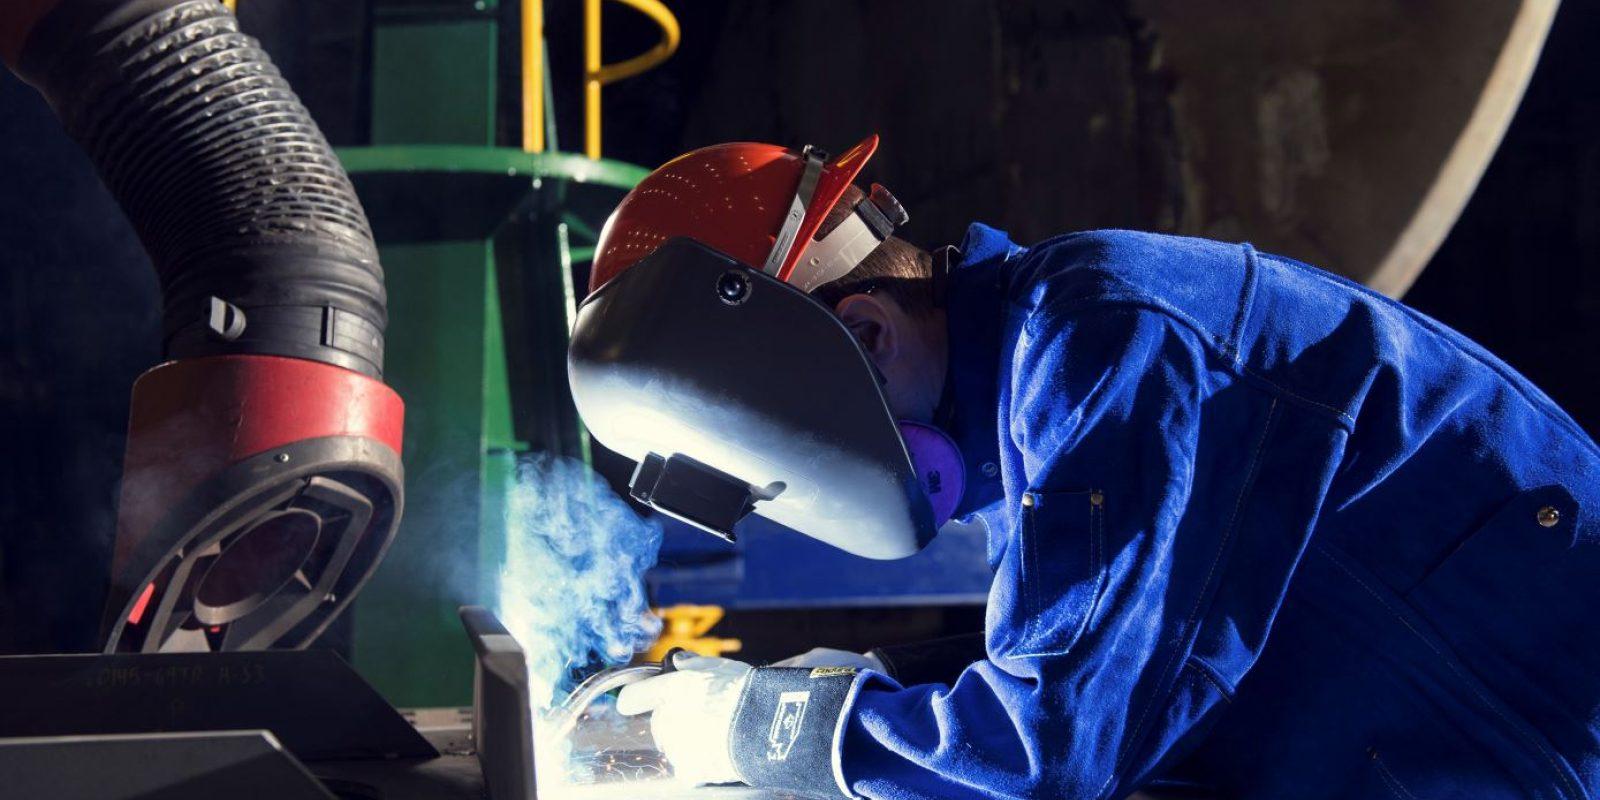 halifax shipyard welder going for gold at skills canada